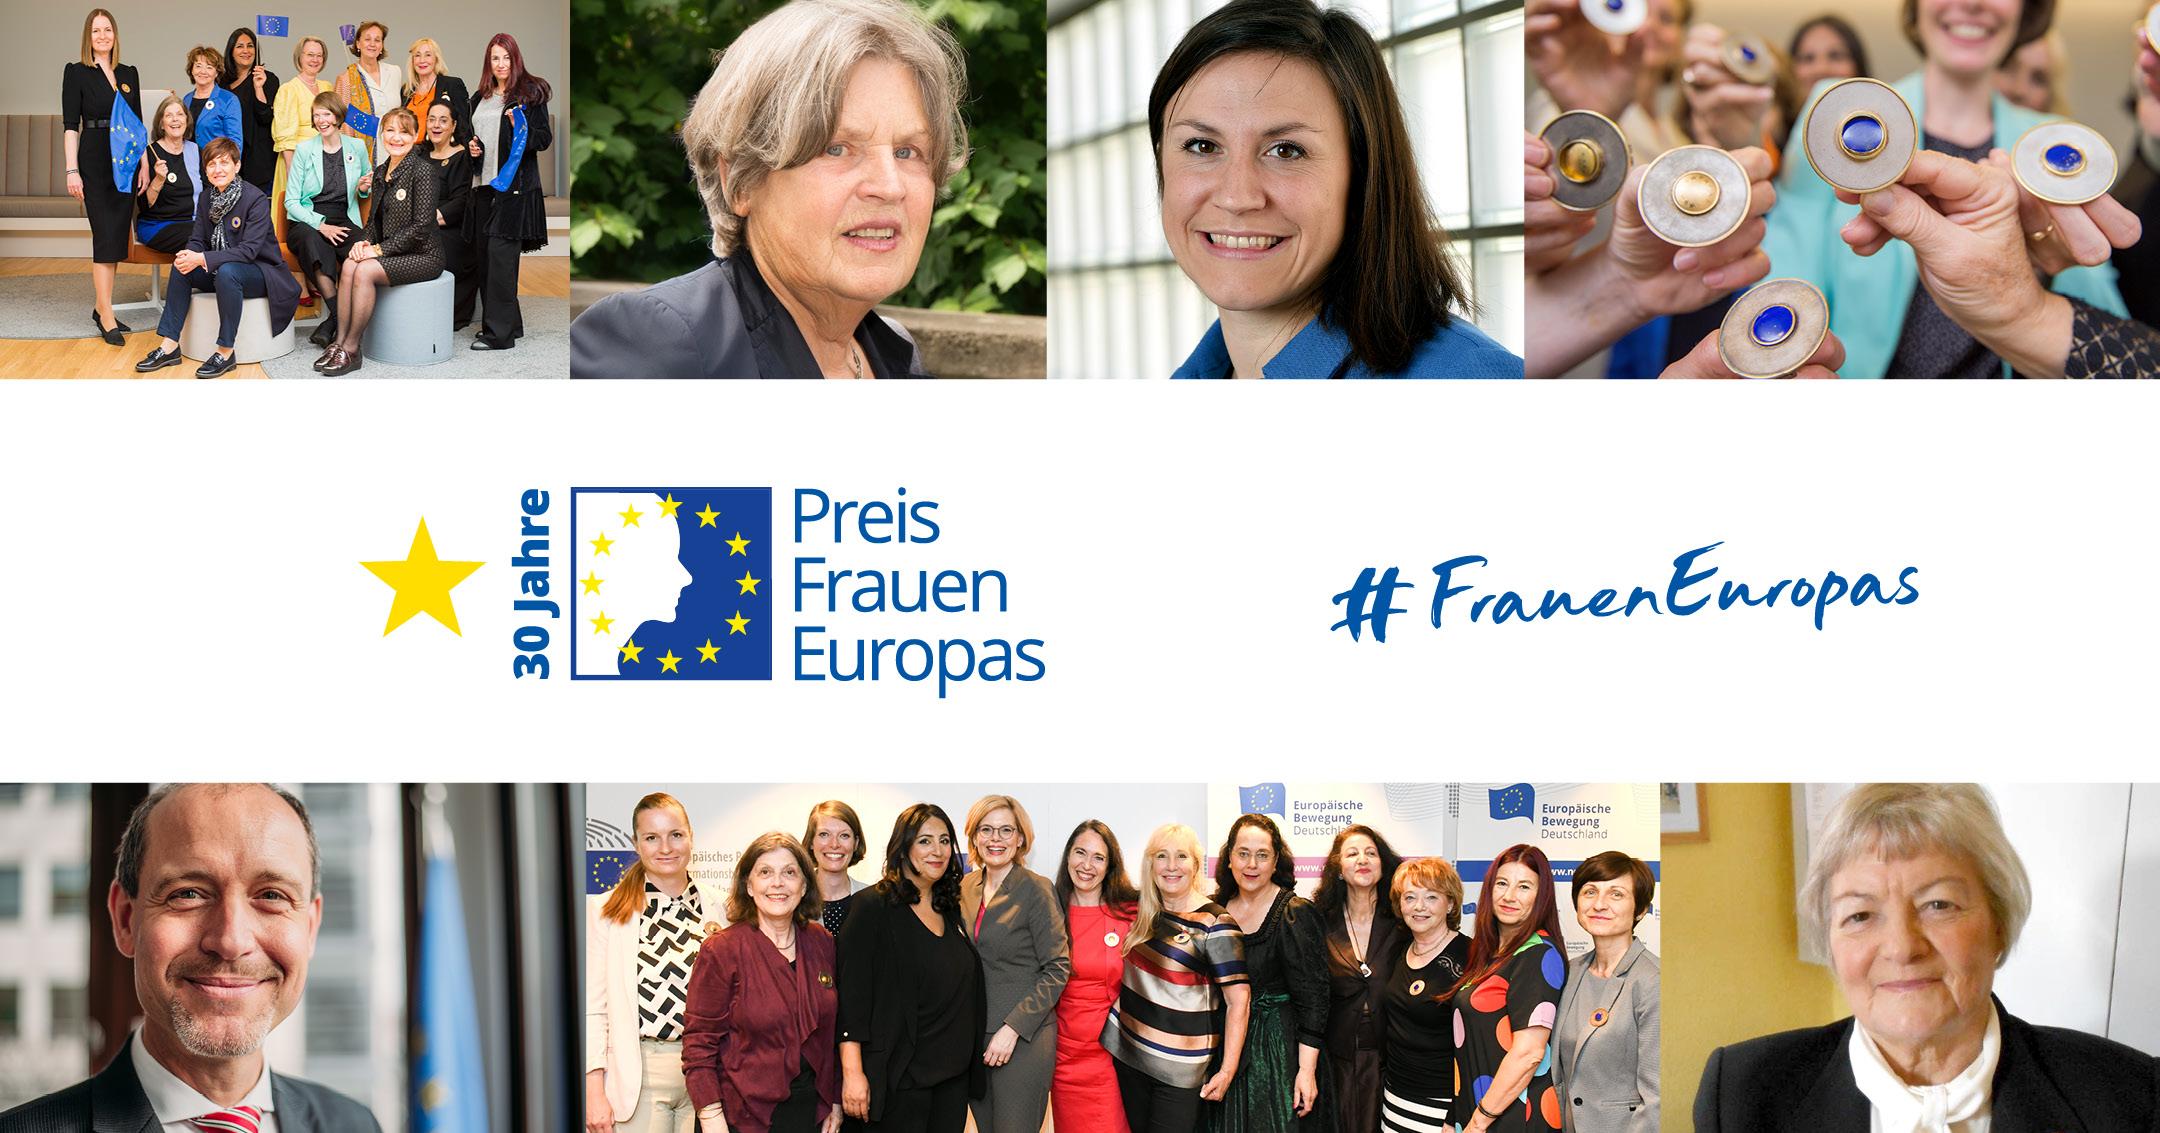 Preisverleihung Preis Frauen Europas 2021